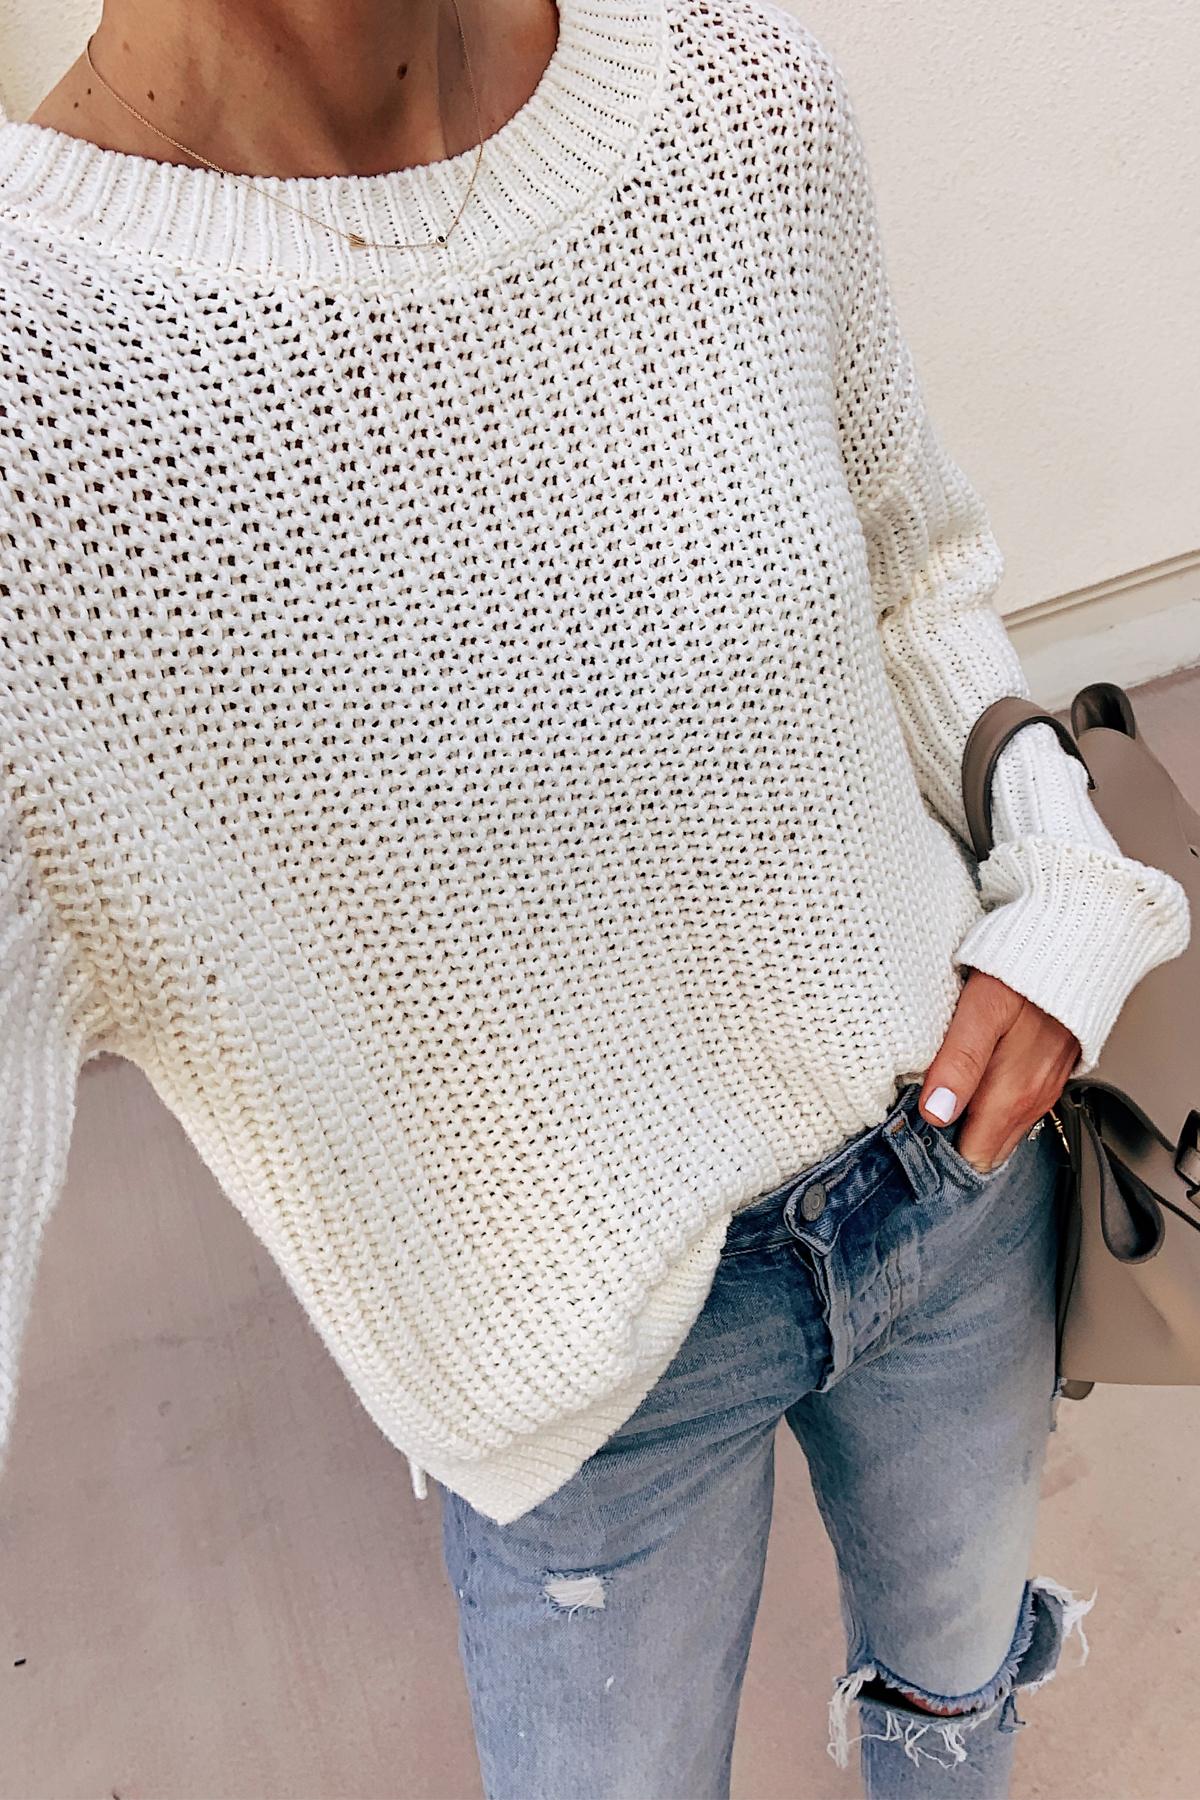 Fashion Jackson Wearing White Sweater Ripped Jeans